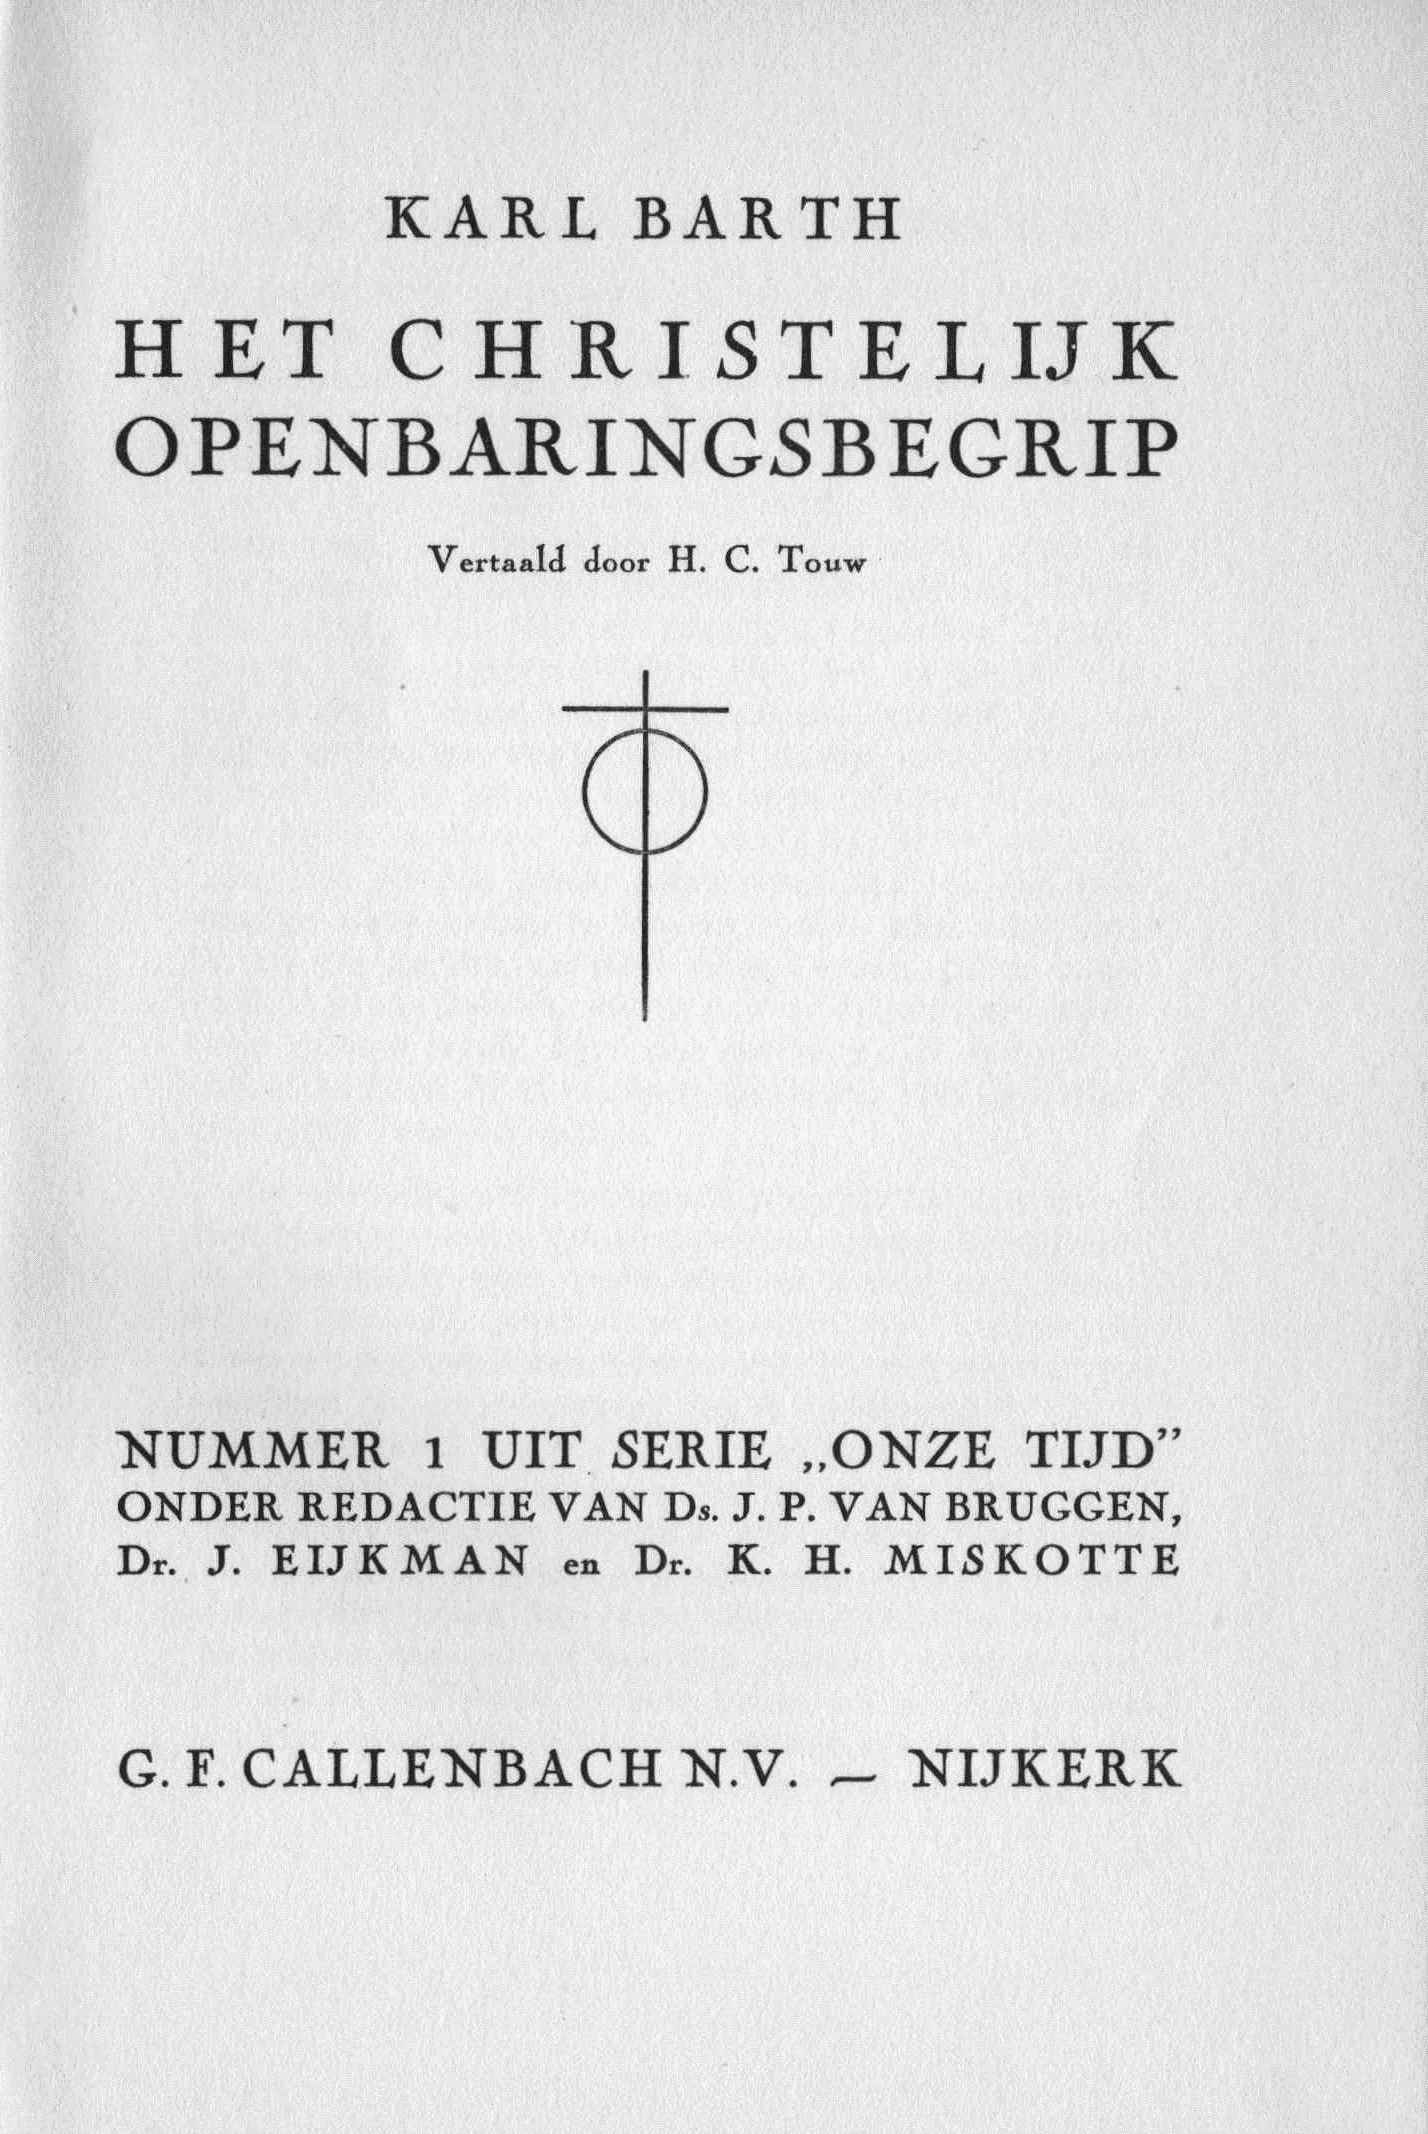 Openbaringsbegrip001